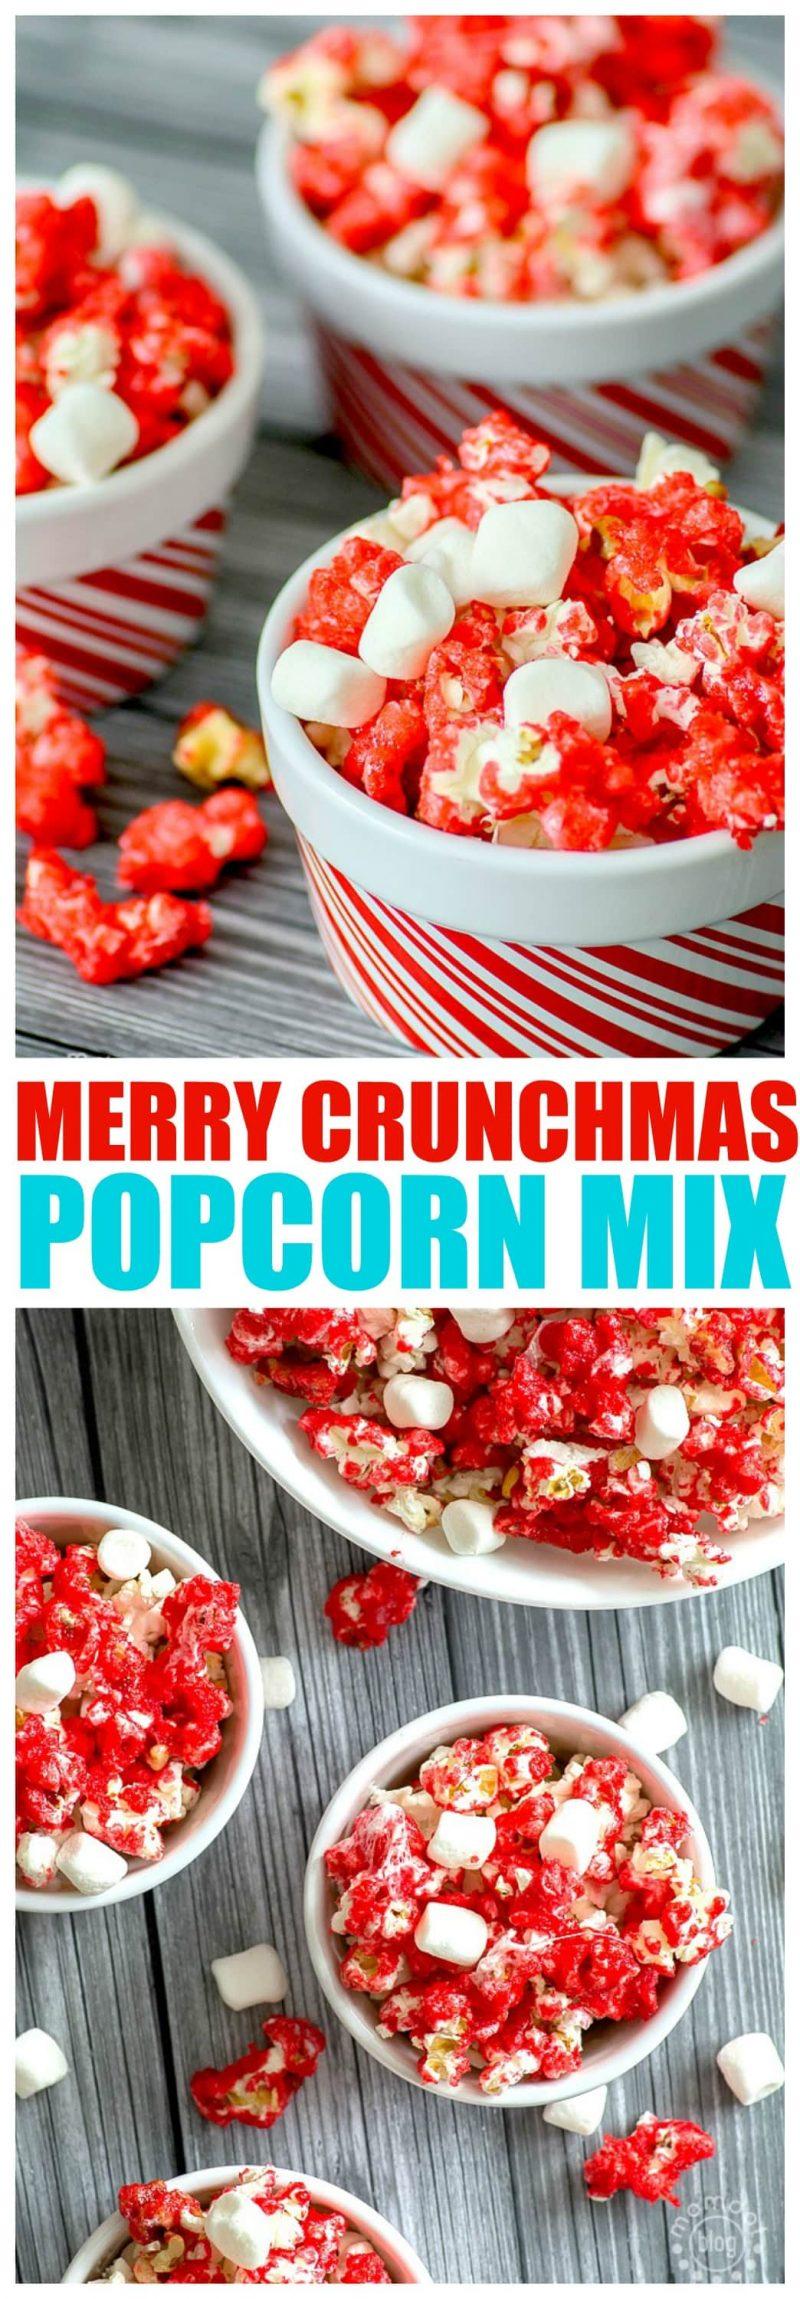 Merry Crunchmas PopCorn Recipe, 2 delicious ways to enjoy holiday popcorn with printable recipe, 10 minute